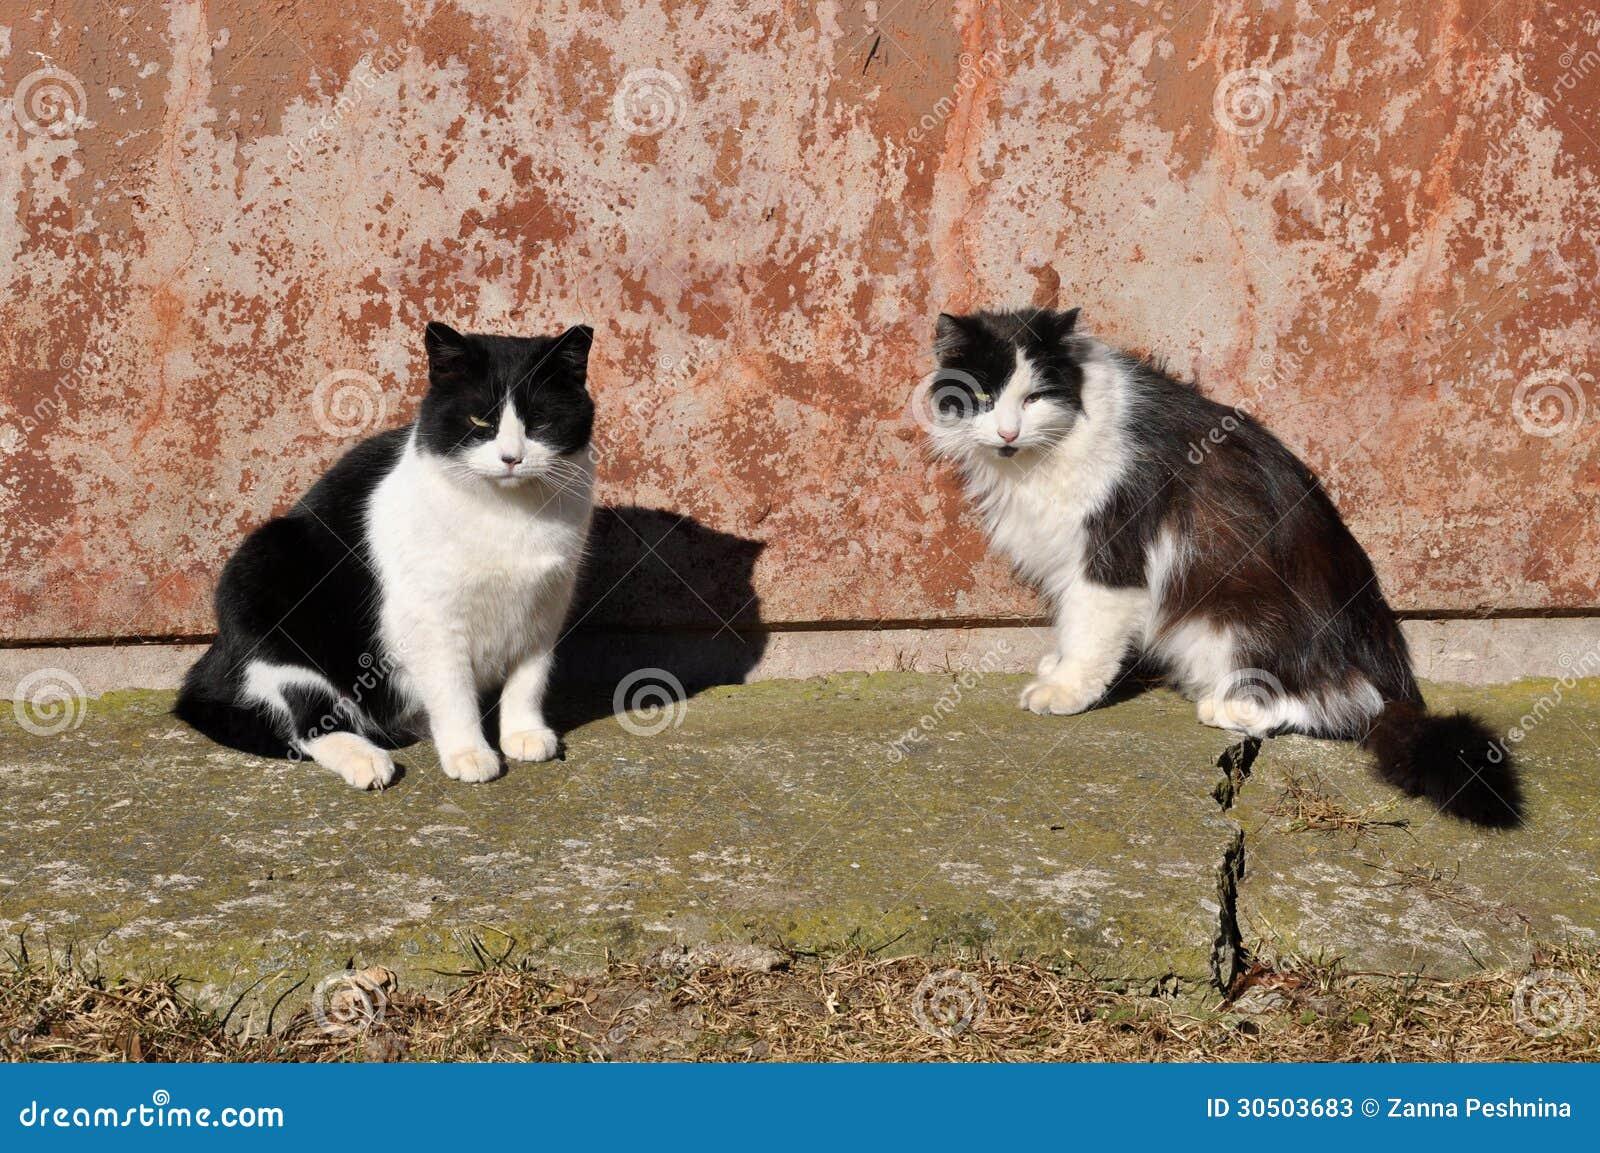 Presentar un nuevo gatito a un gato adulto - Hills Pet